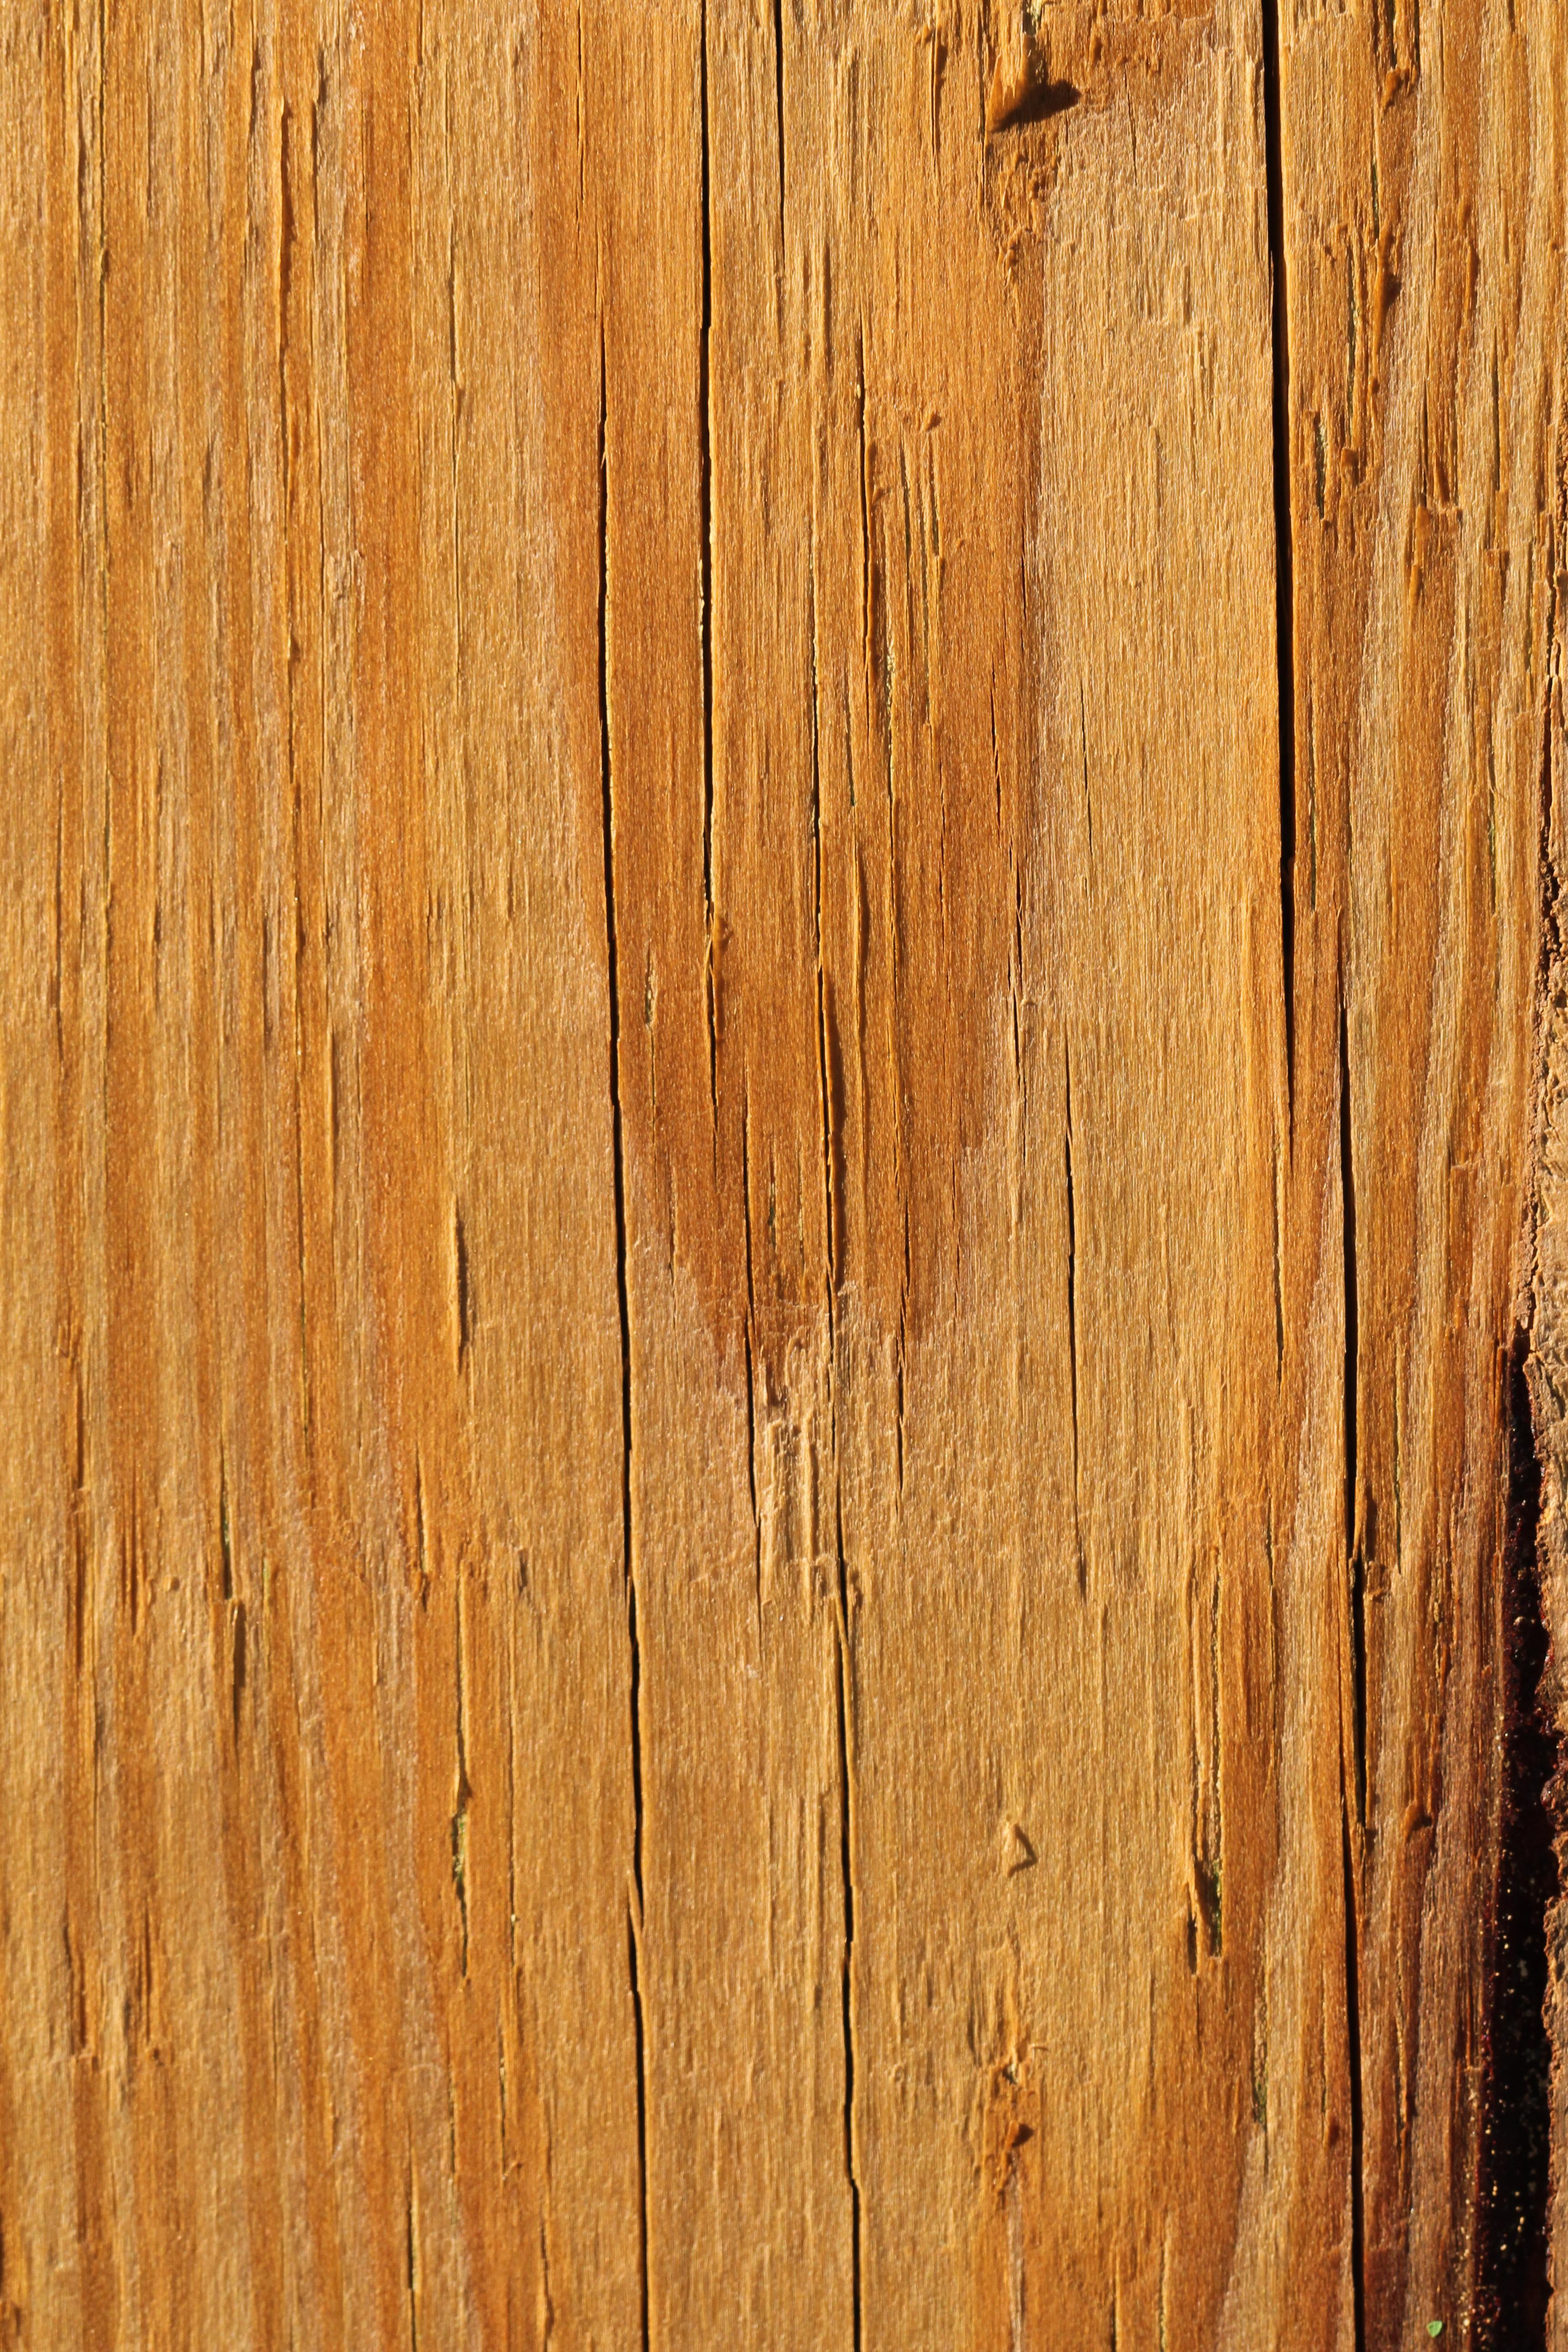 Wooden Board Texture, Board, Brown, Freetexturefrida, Surface, HQ Photo